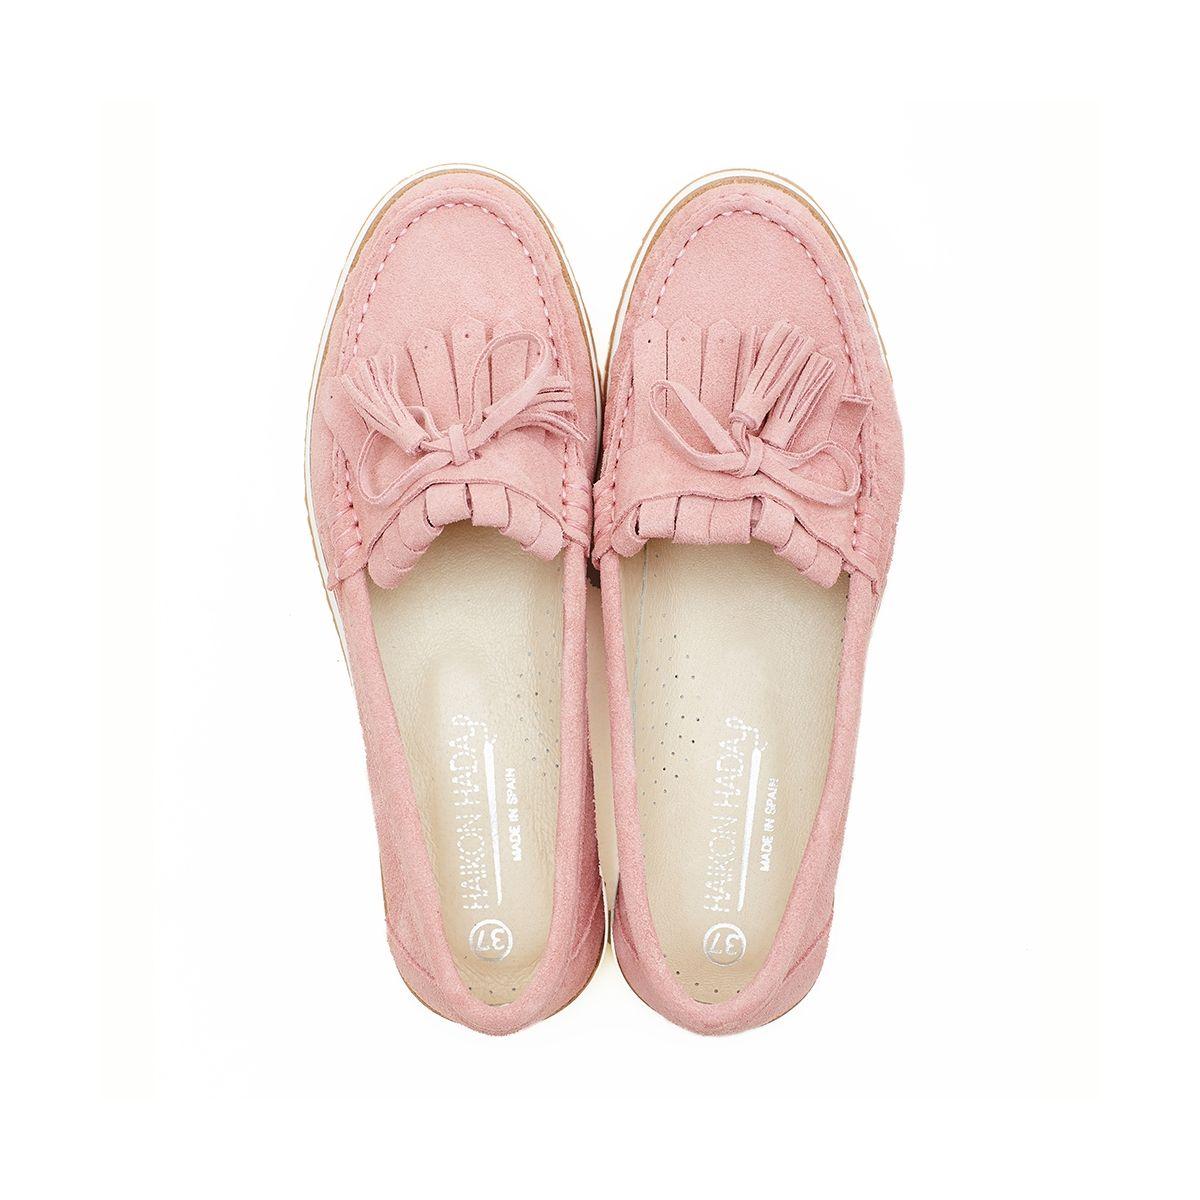 Haikon Hada Haikon Hada Afelpado Antique Mokasyny Buty Damskie Shoes Slippers Mule Shoe